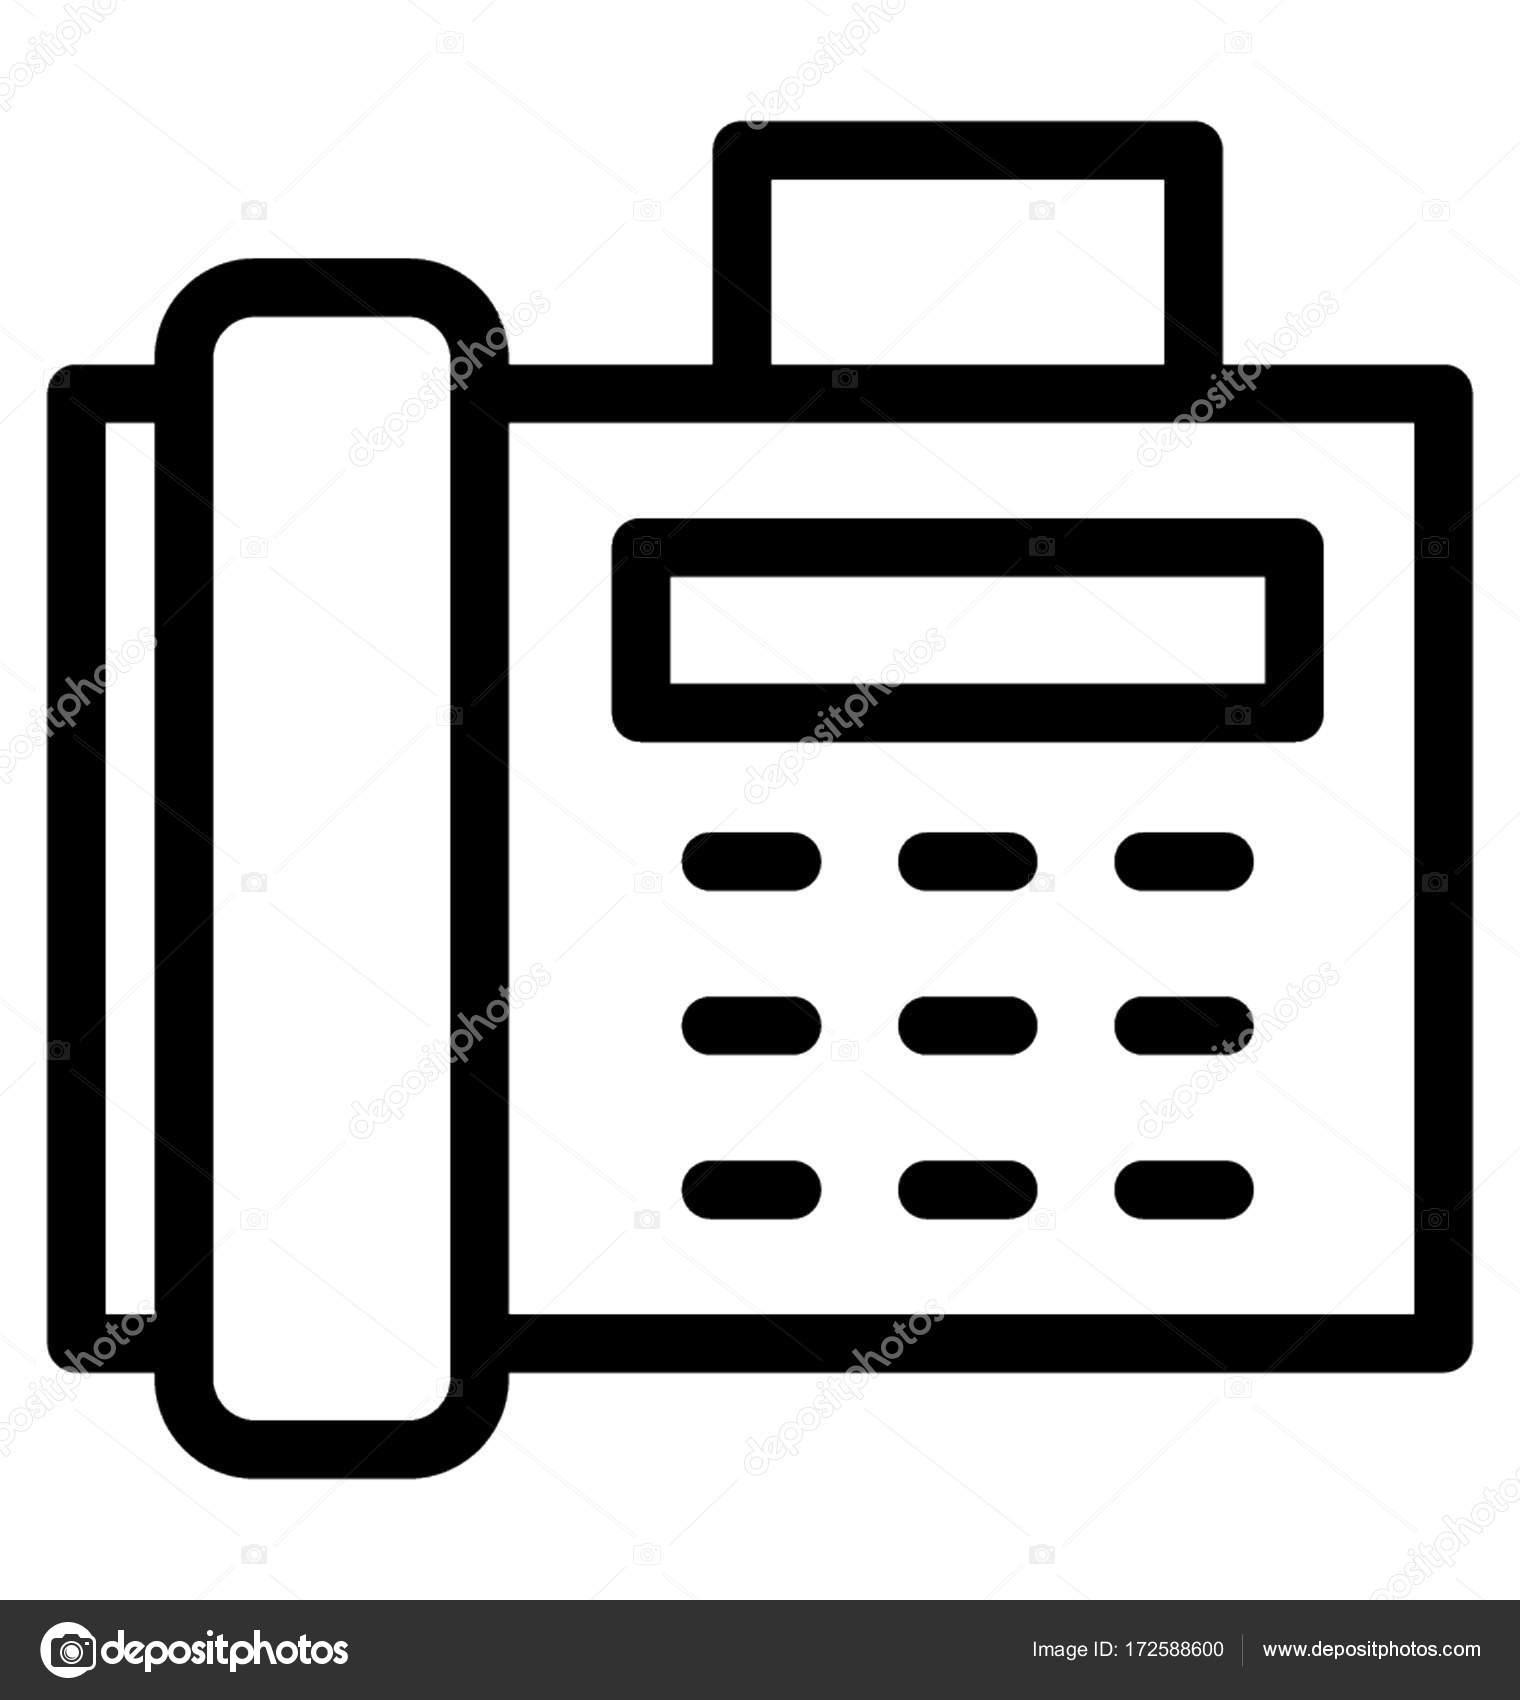 fax vector icon stock vector c vectorsmarket 172588600 https depositphotos com 172588600 stock illustration fax vector icon html